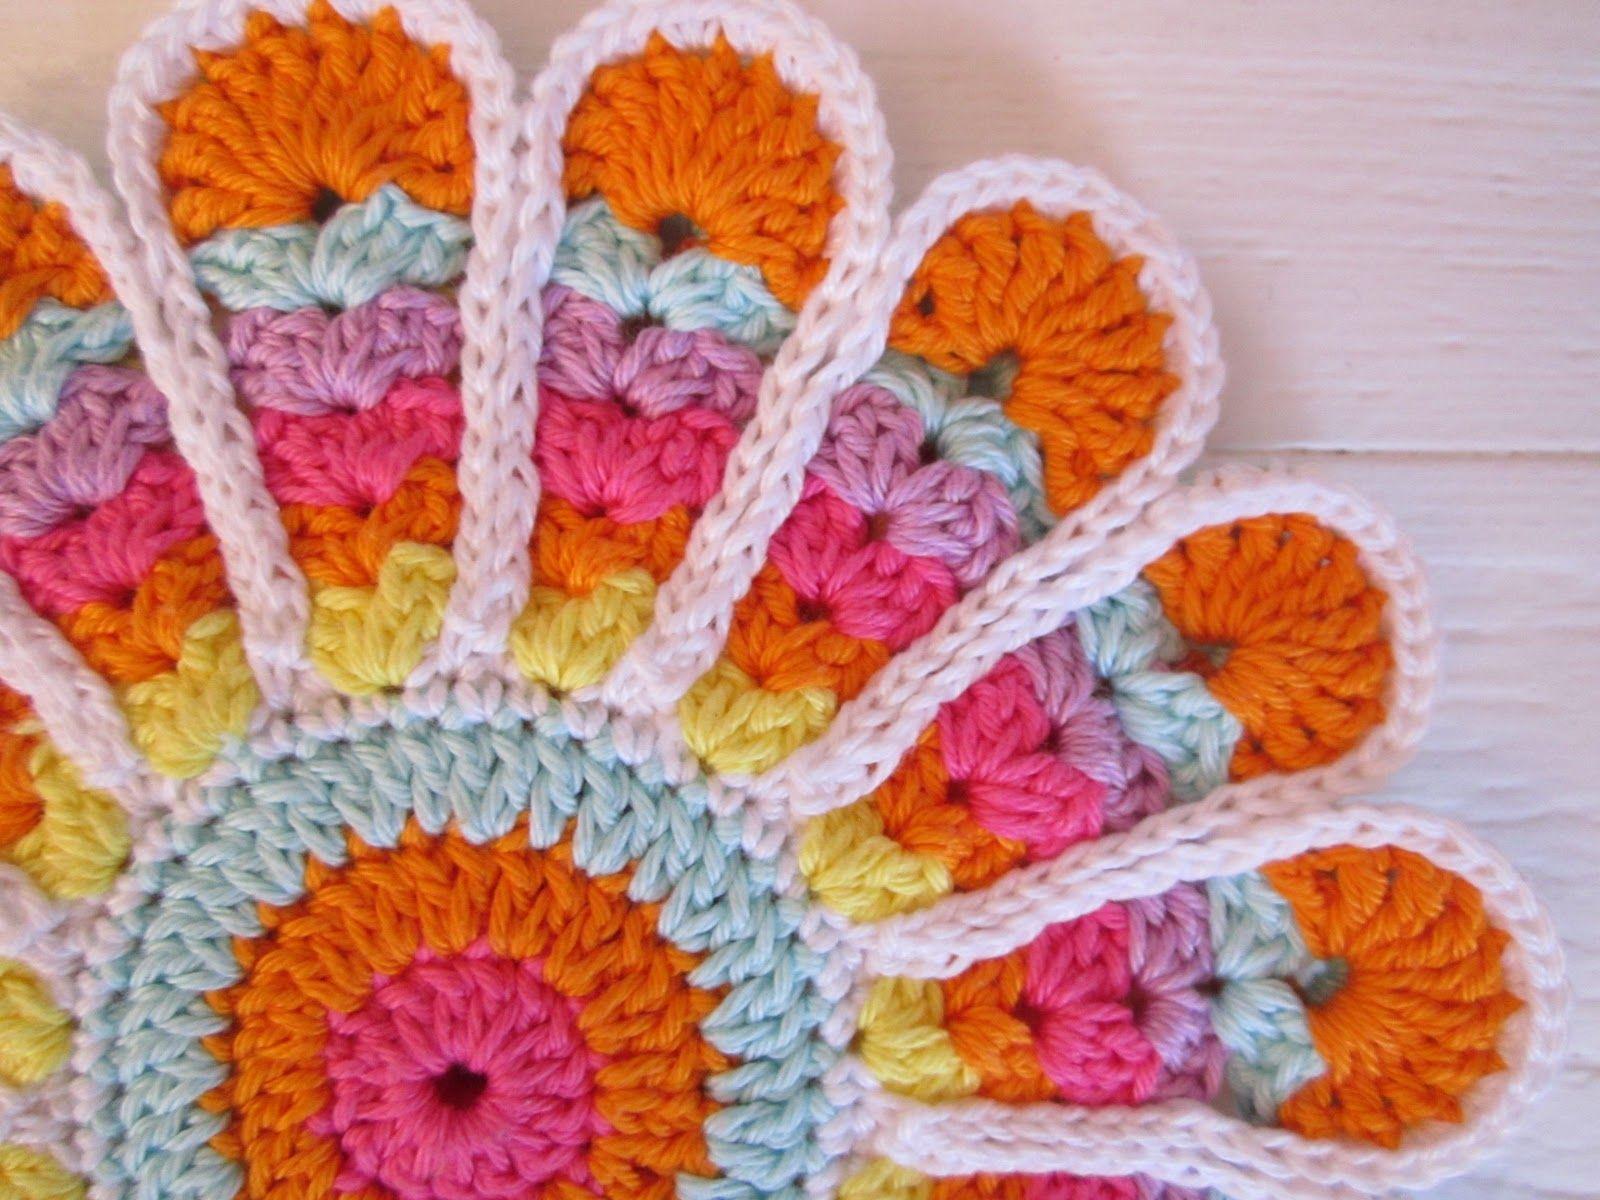 Vintage Flower Potholder By Jennifer Poort-Larche - Free Crochet ...